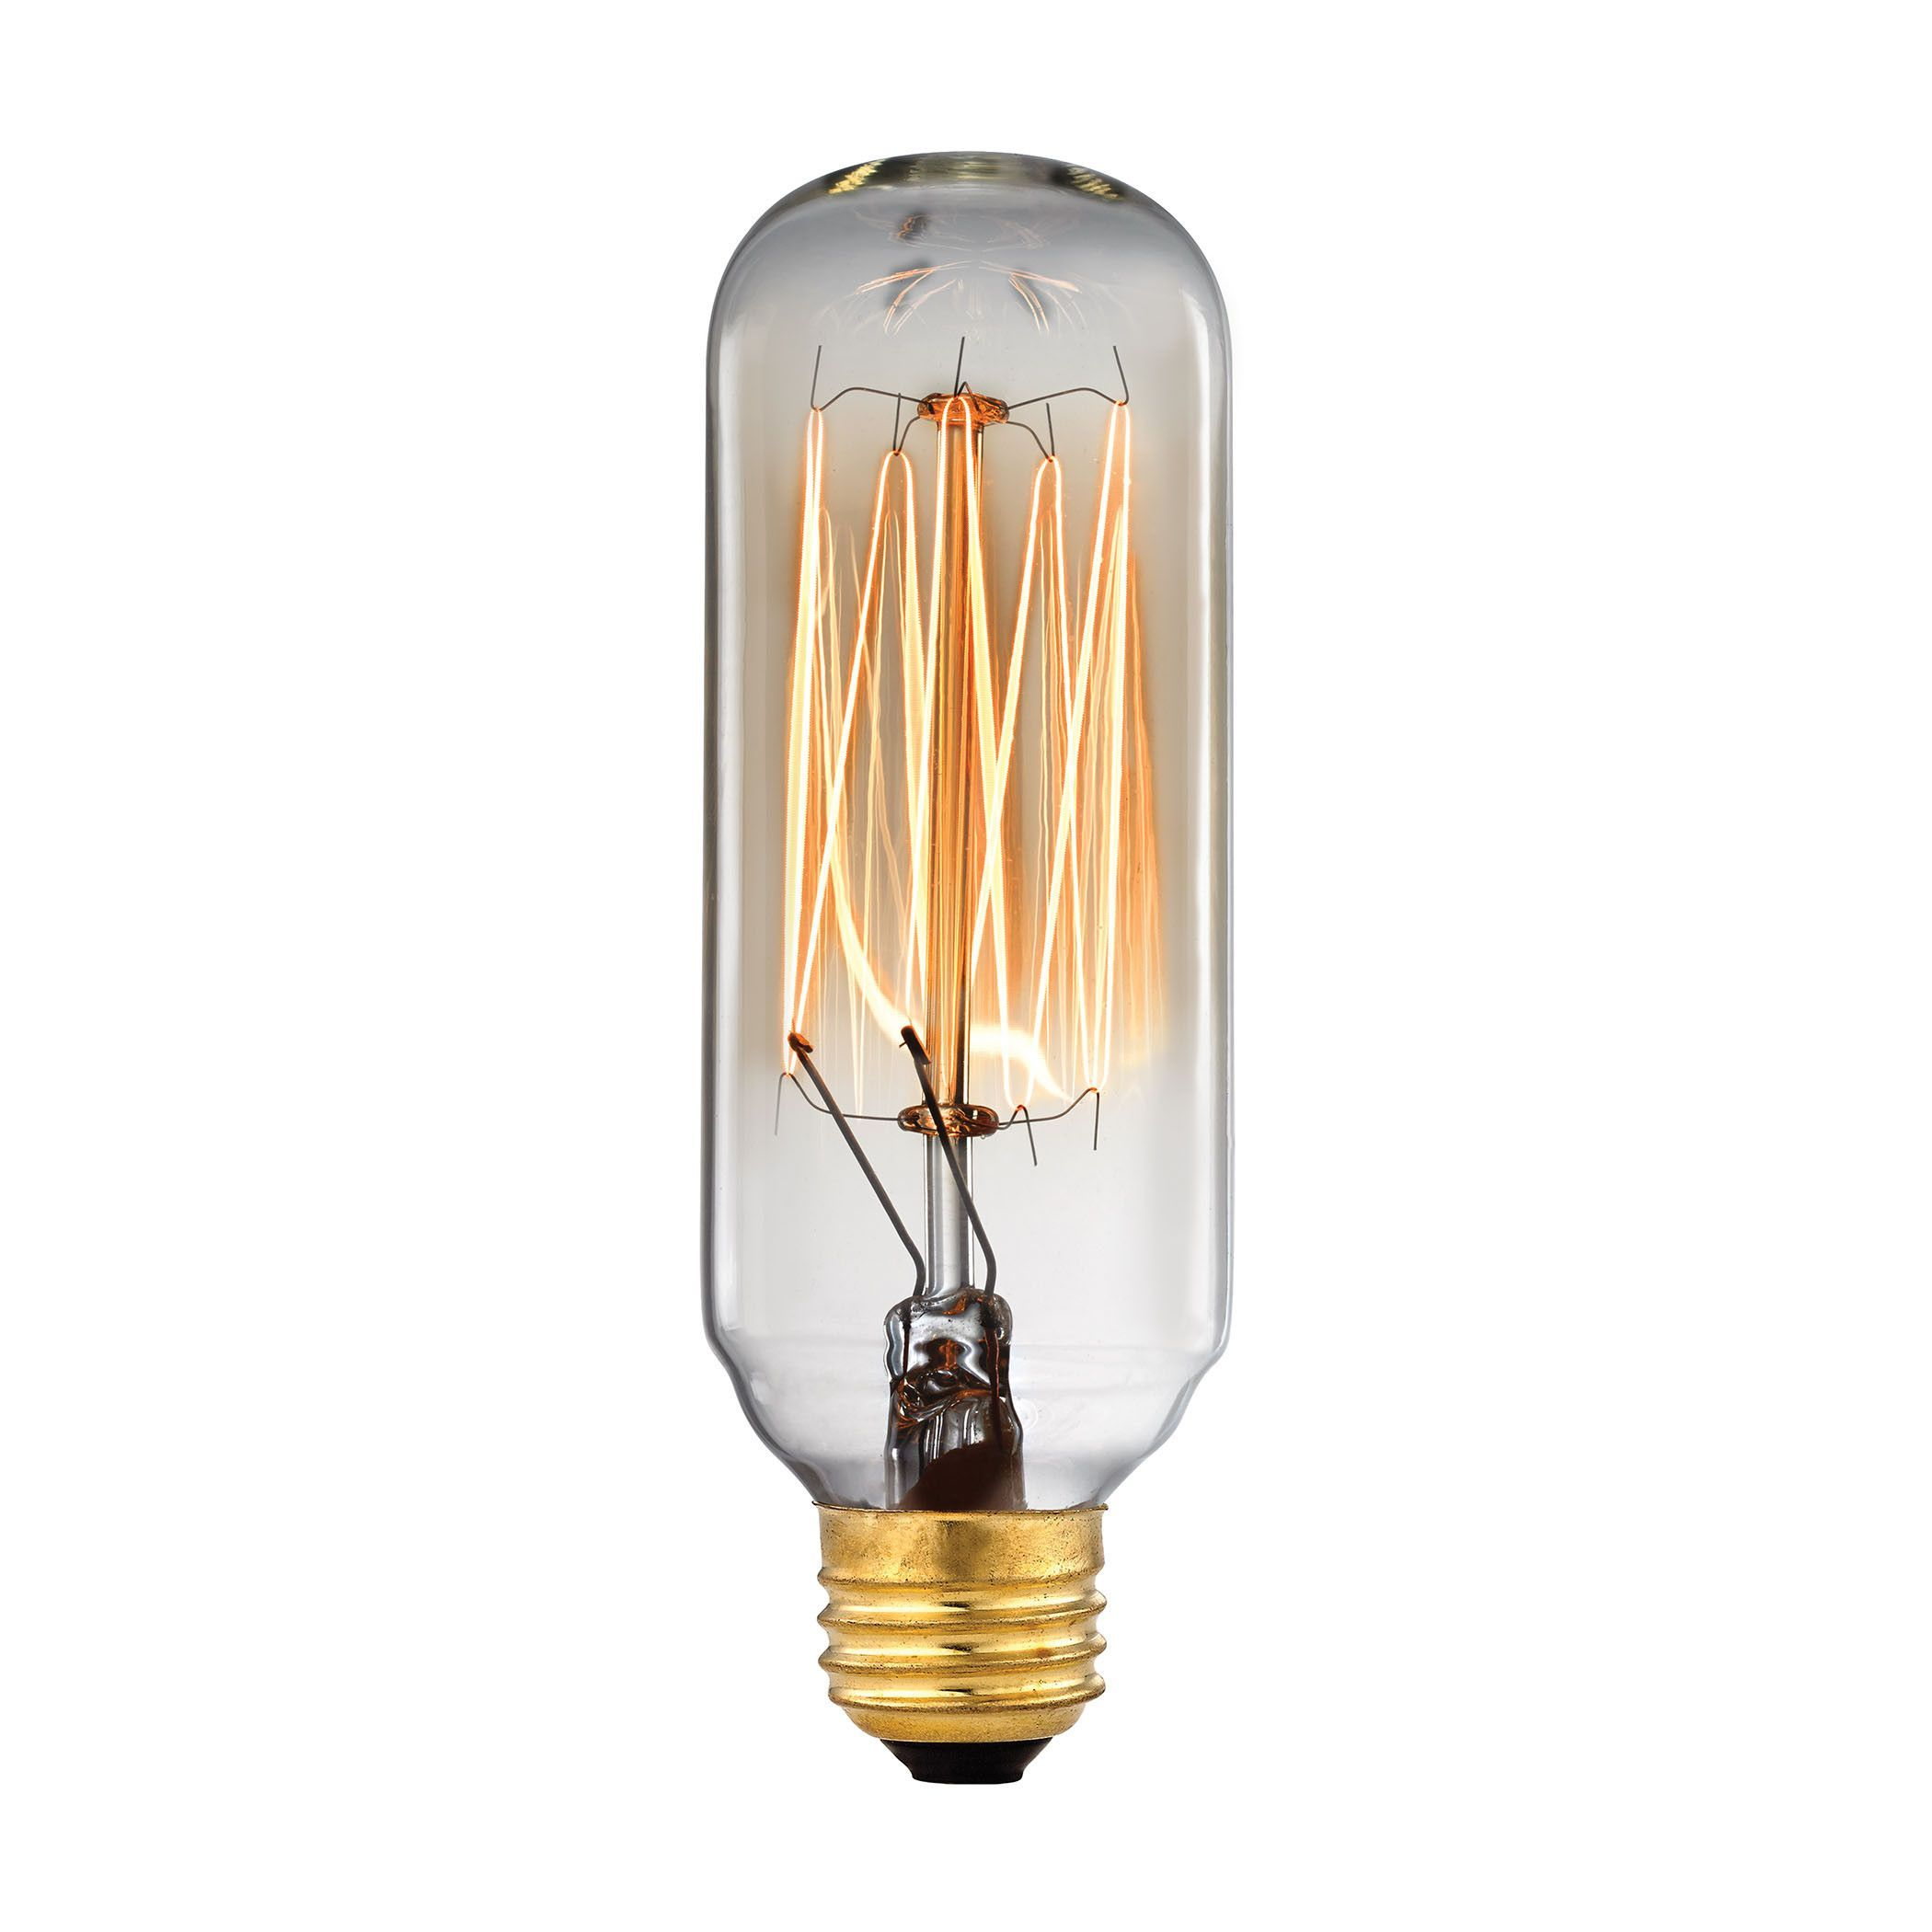 Vintage filament light bulb 40 watt candelabra base lights vintage filament light bulb 40 watt candelabra base arubaitofo Gallery